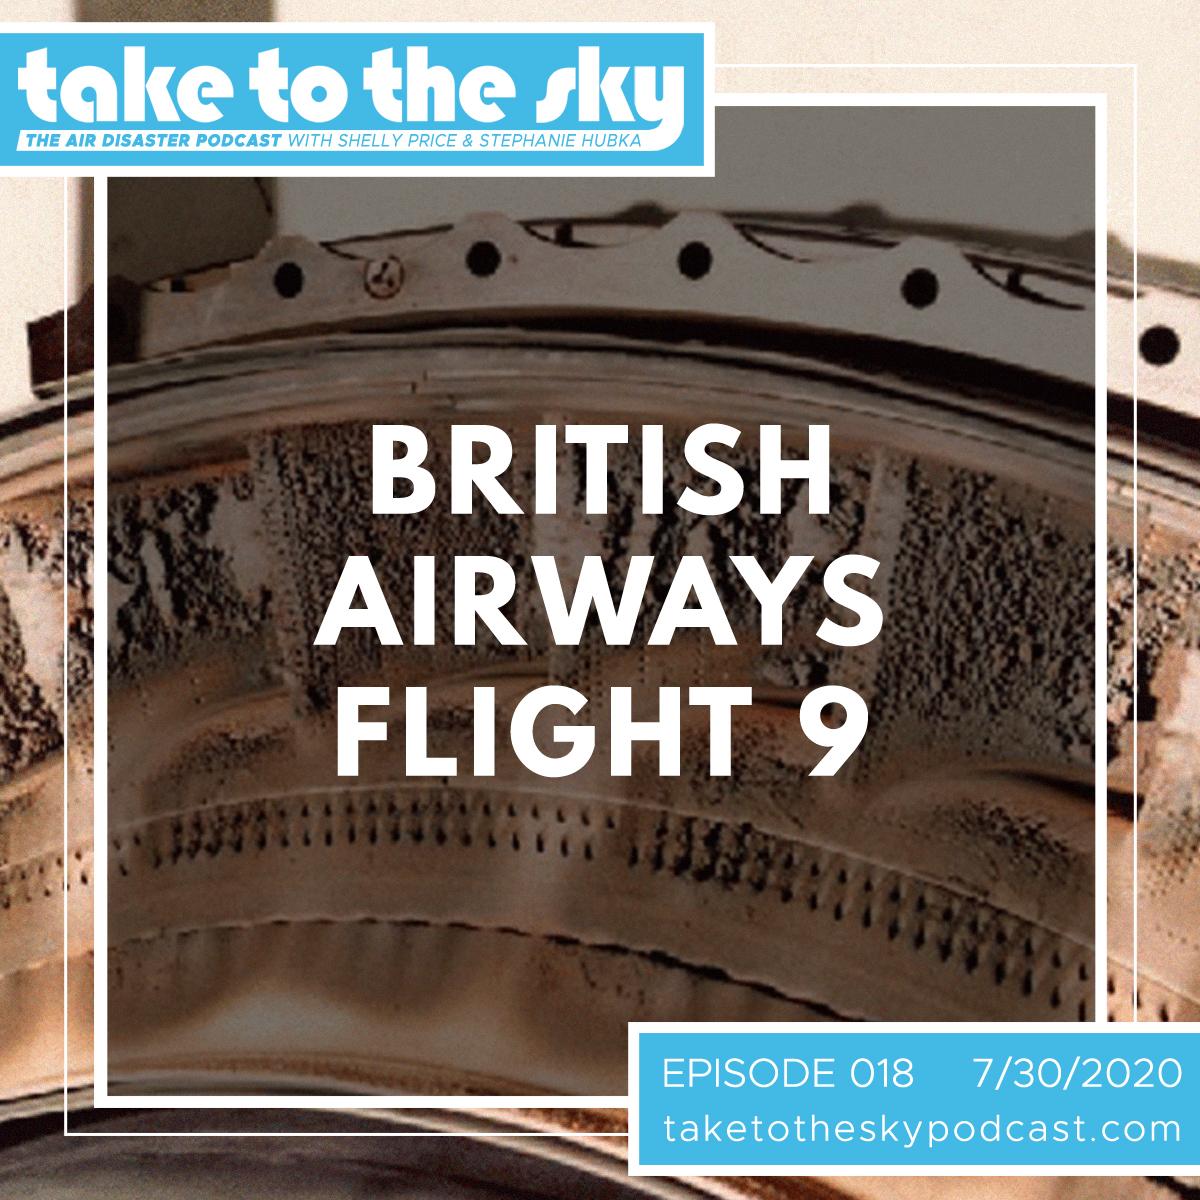 Take to the Sky Episode 018: British Airways Flight 9